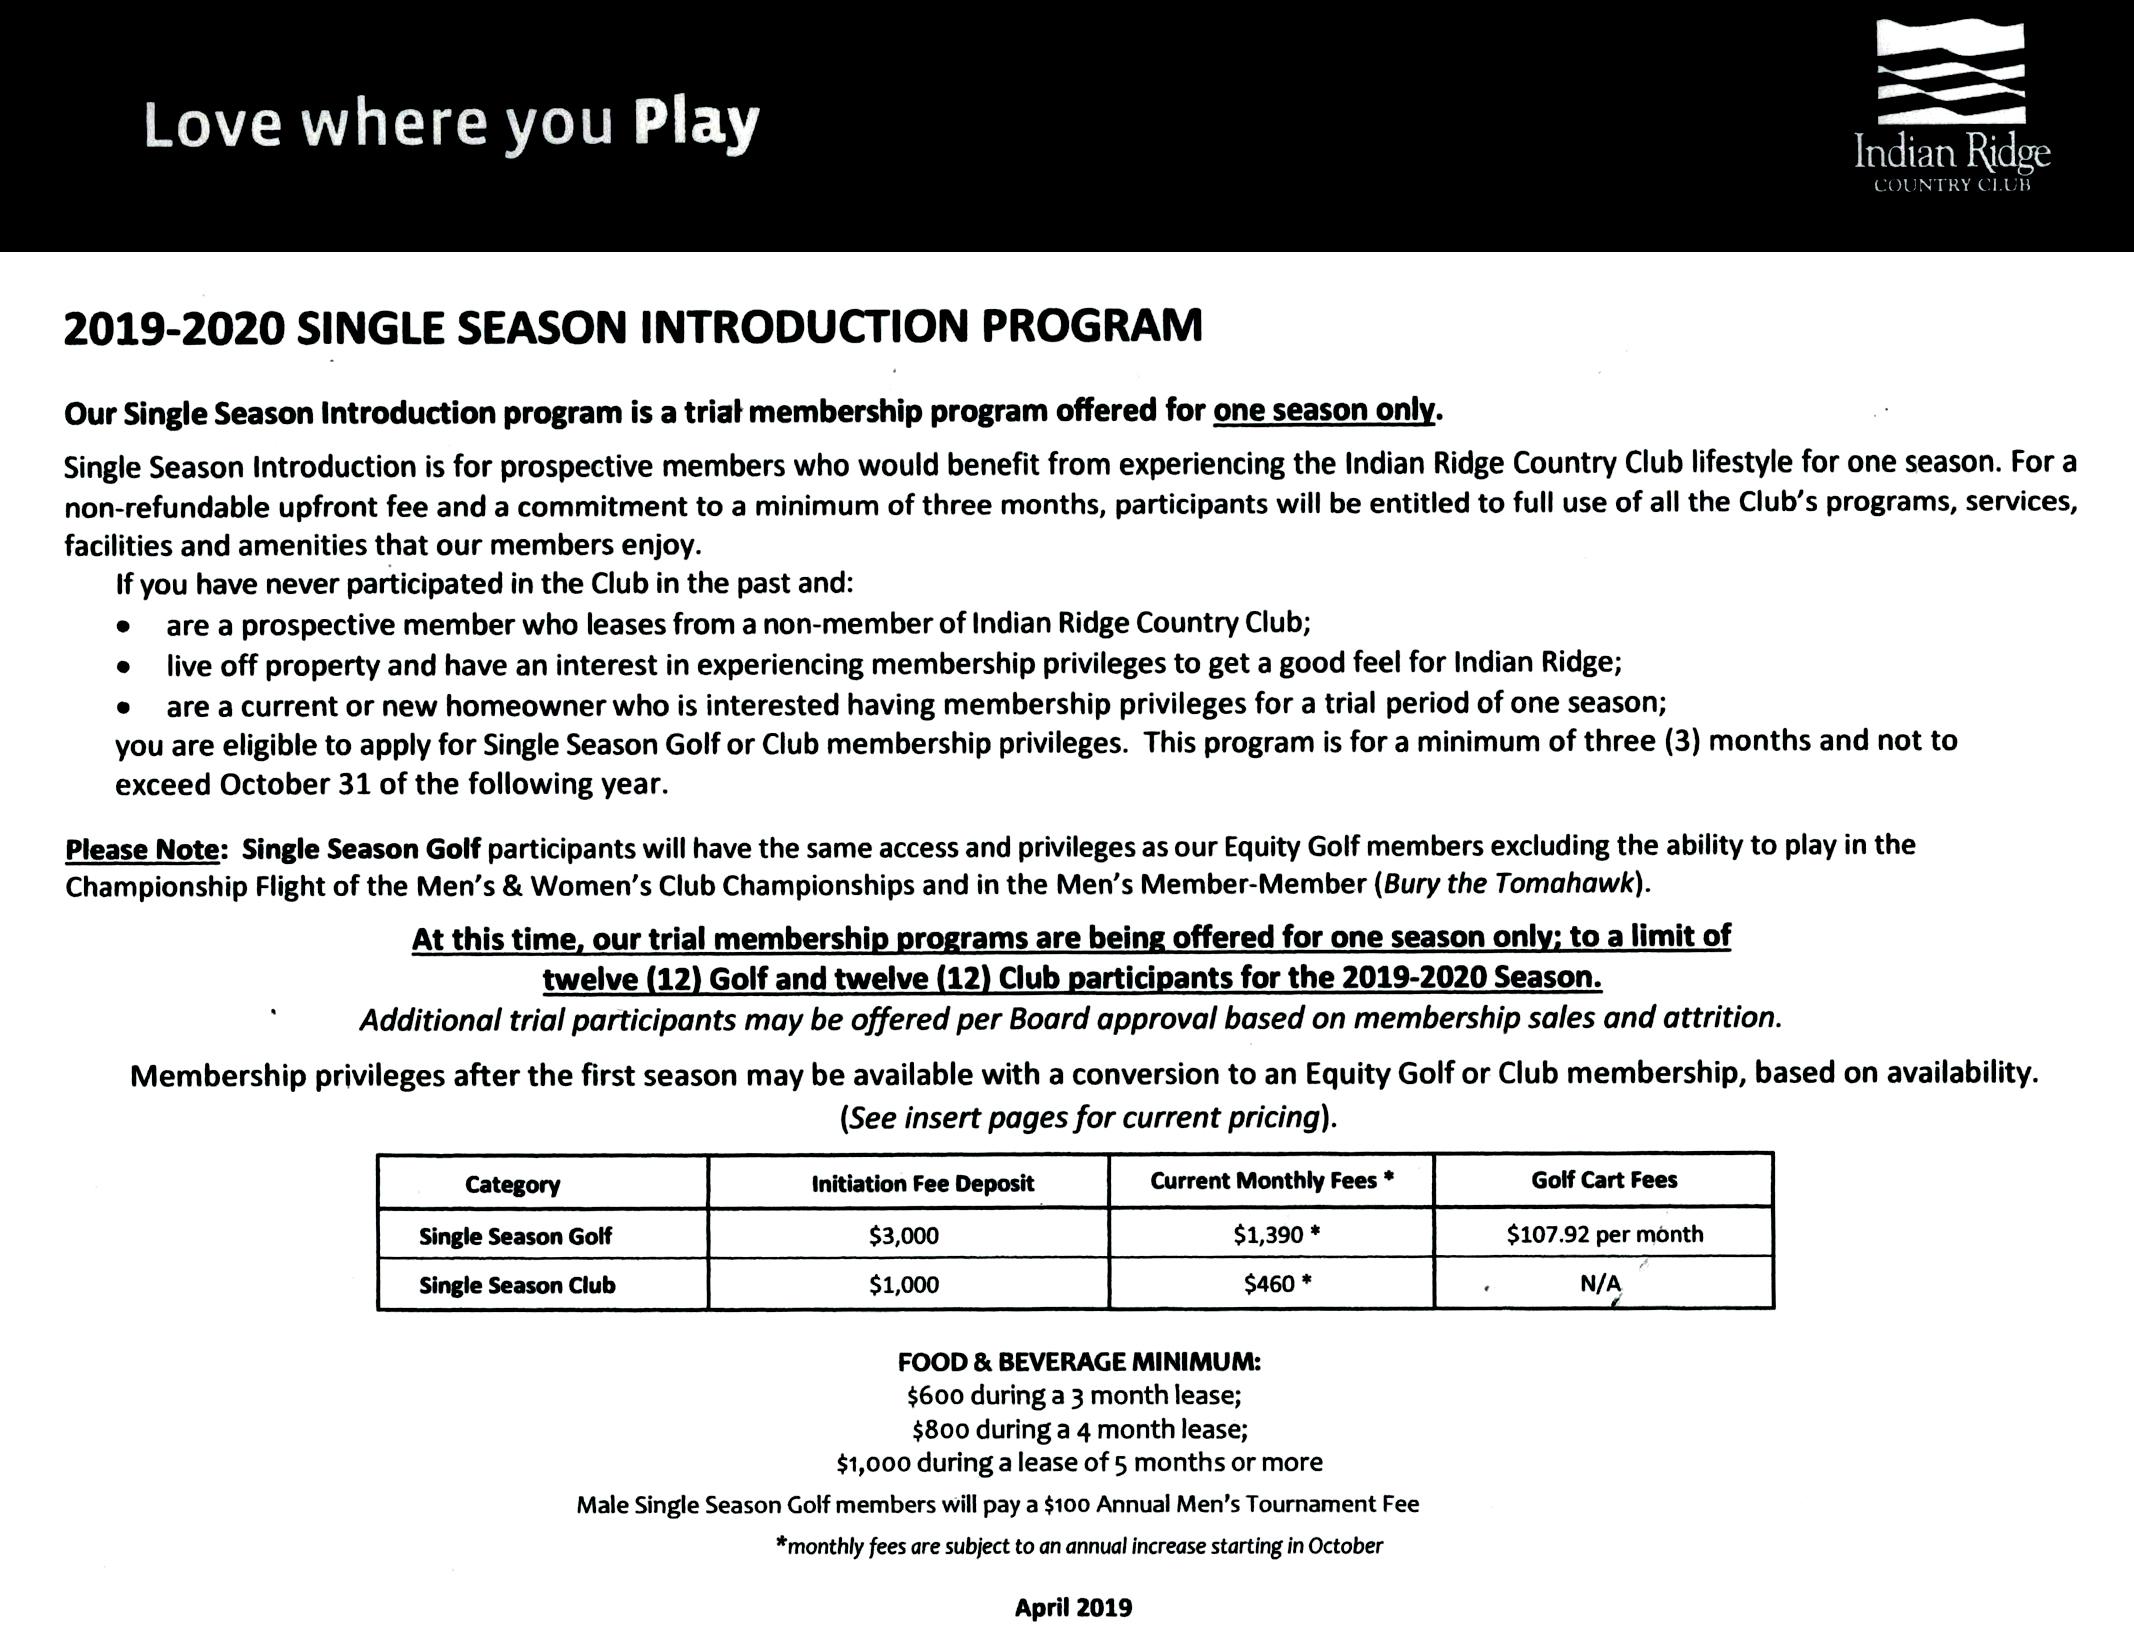 IRCC Single Season Introduction Program